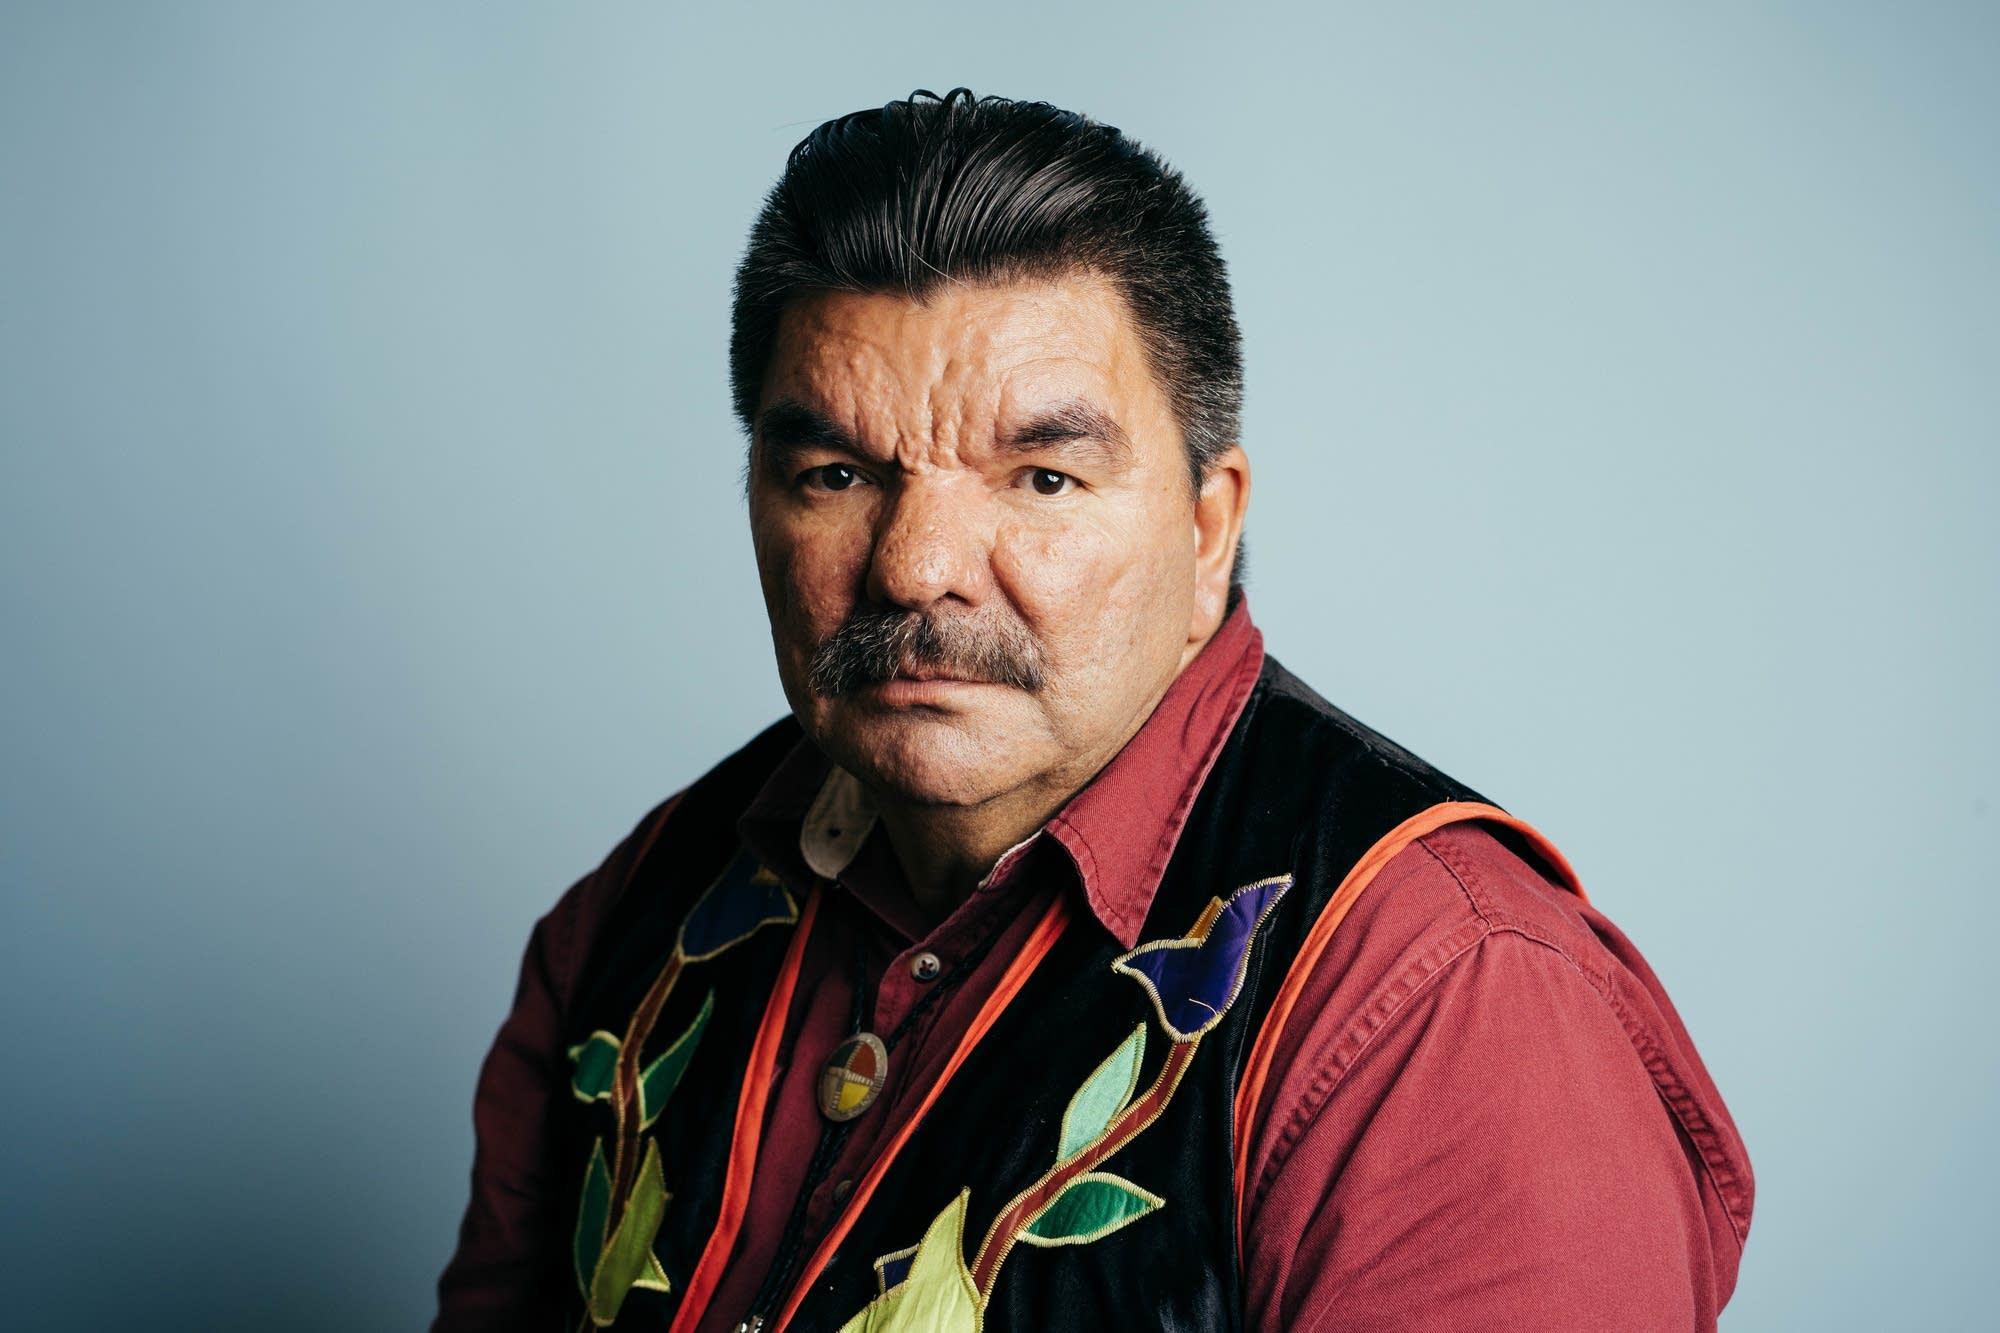 Ricky DeFoe of the Lynx Clan of Ojibwe